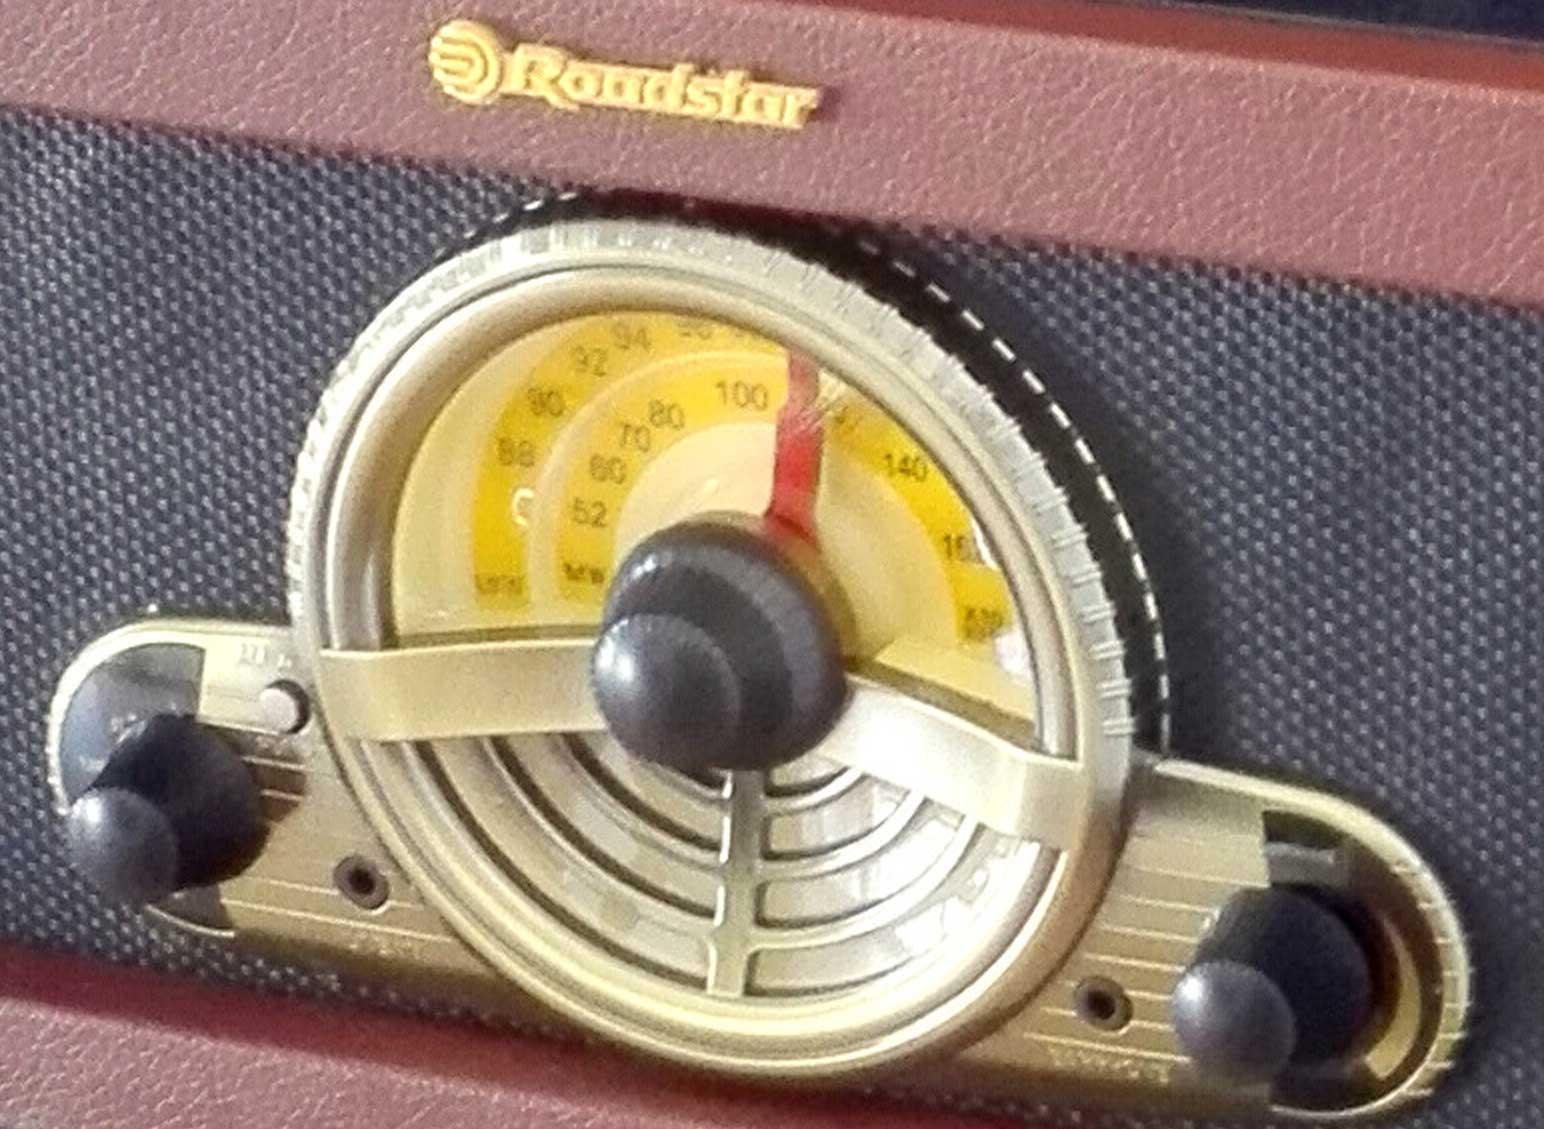 Roadstar Vintage music funitur